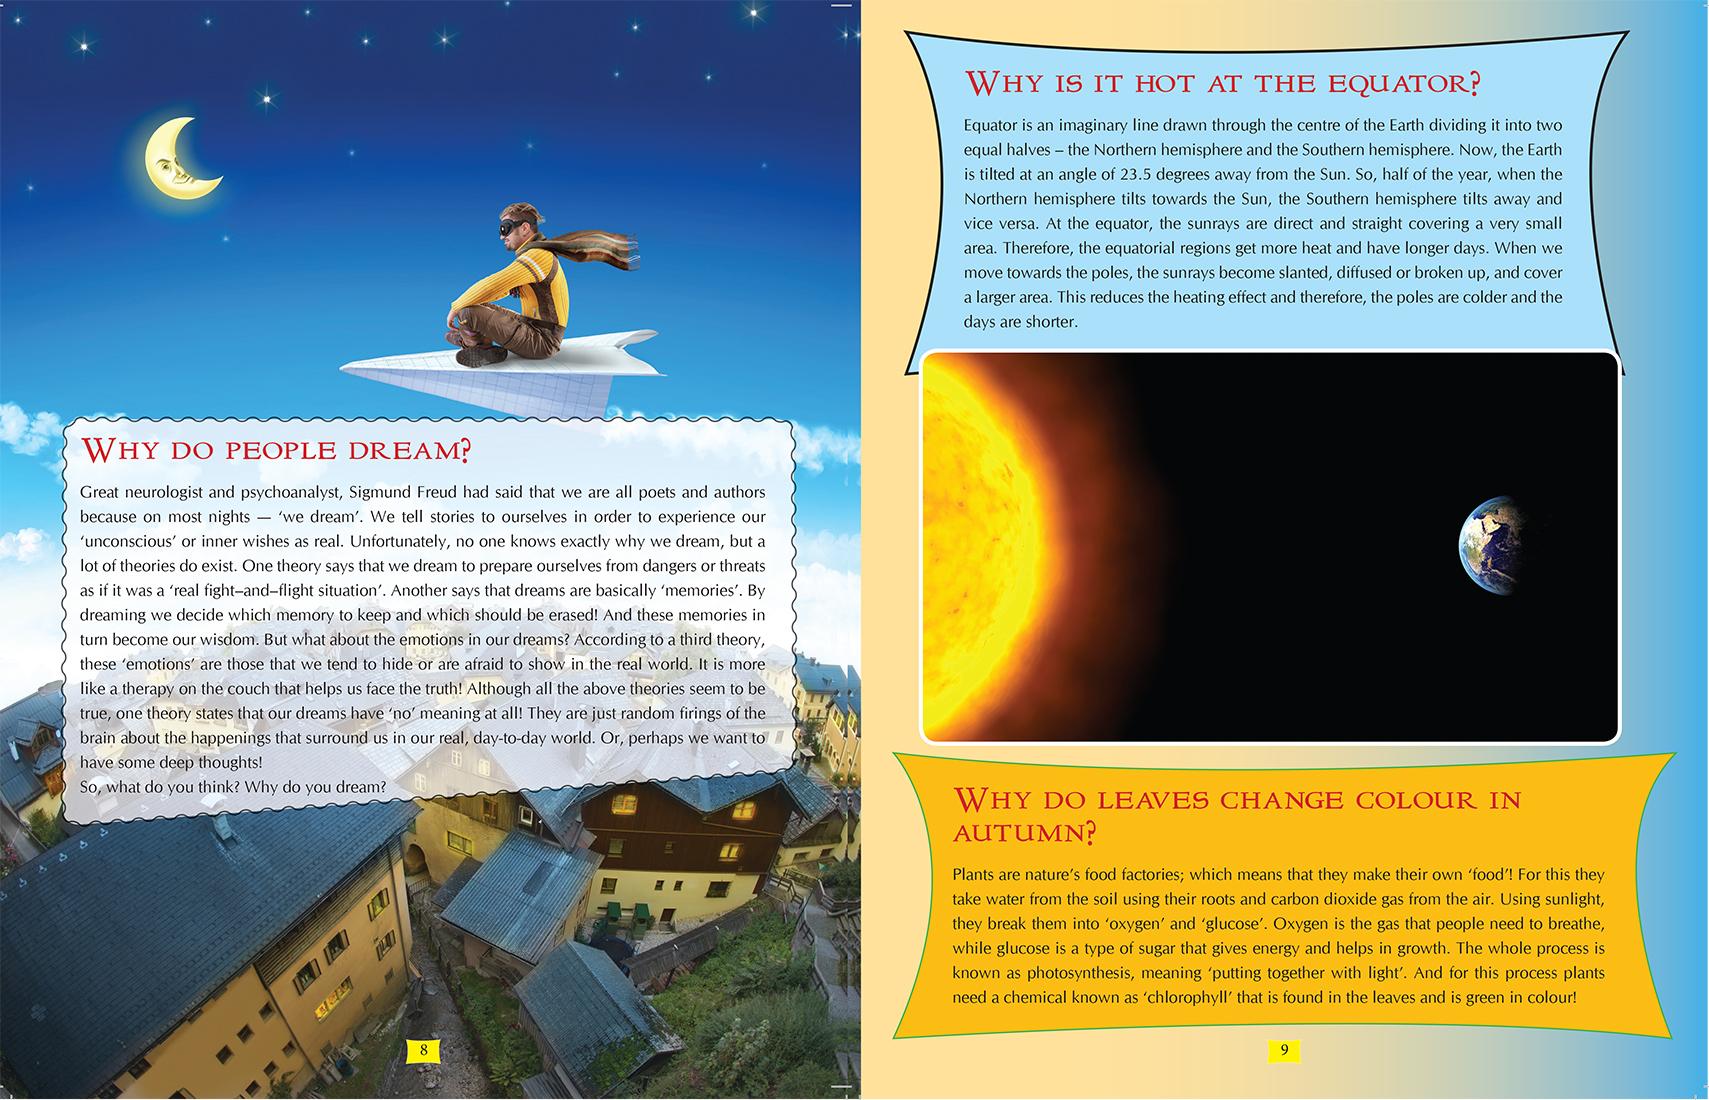 Children's Encyclopedia Amazing Facts